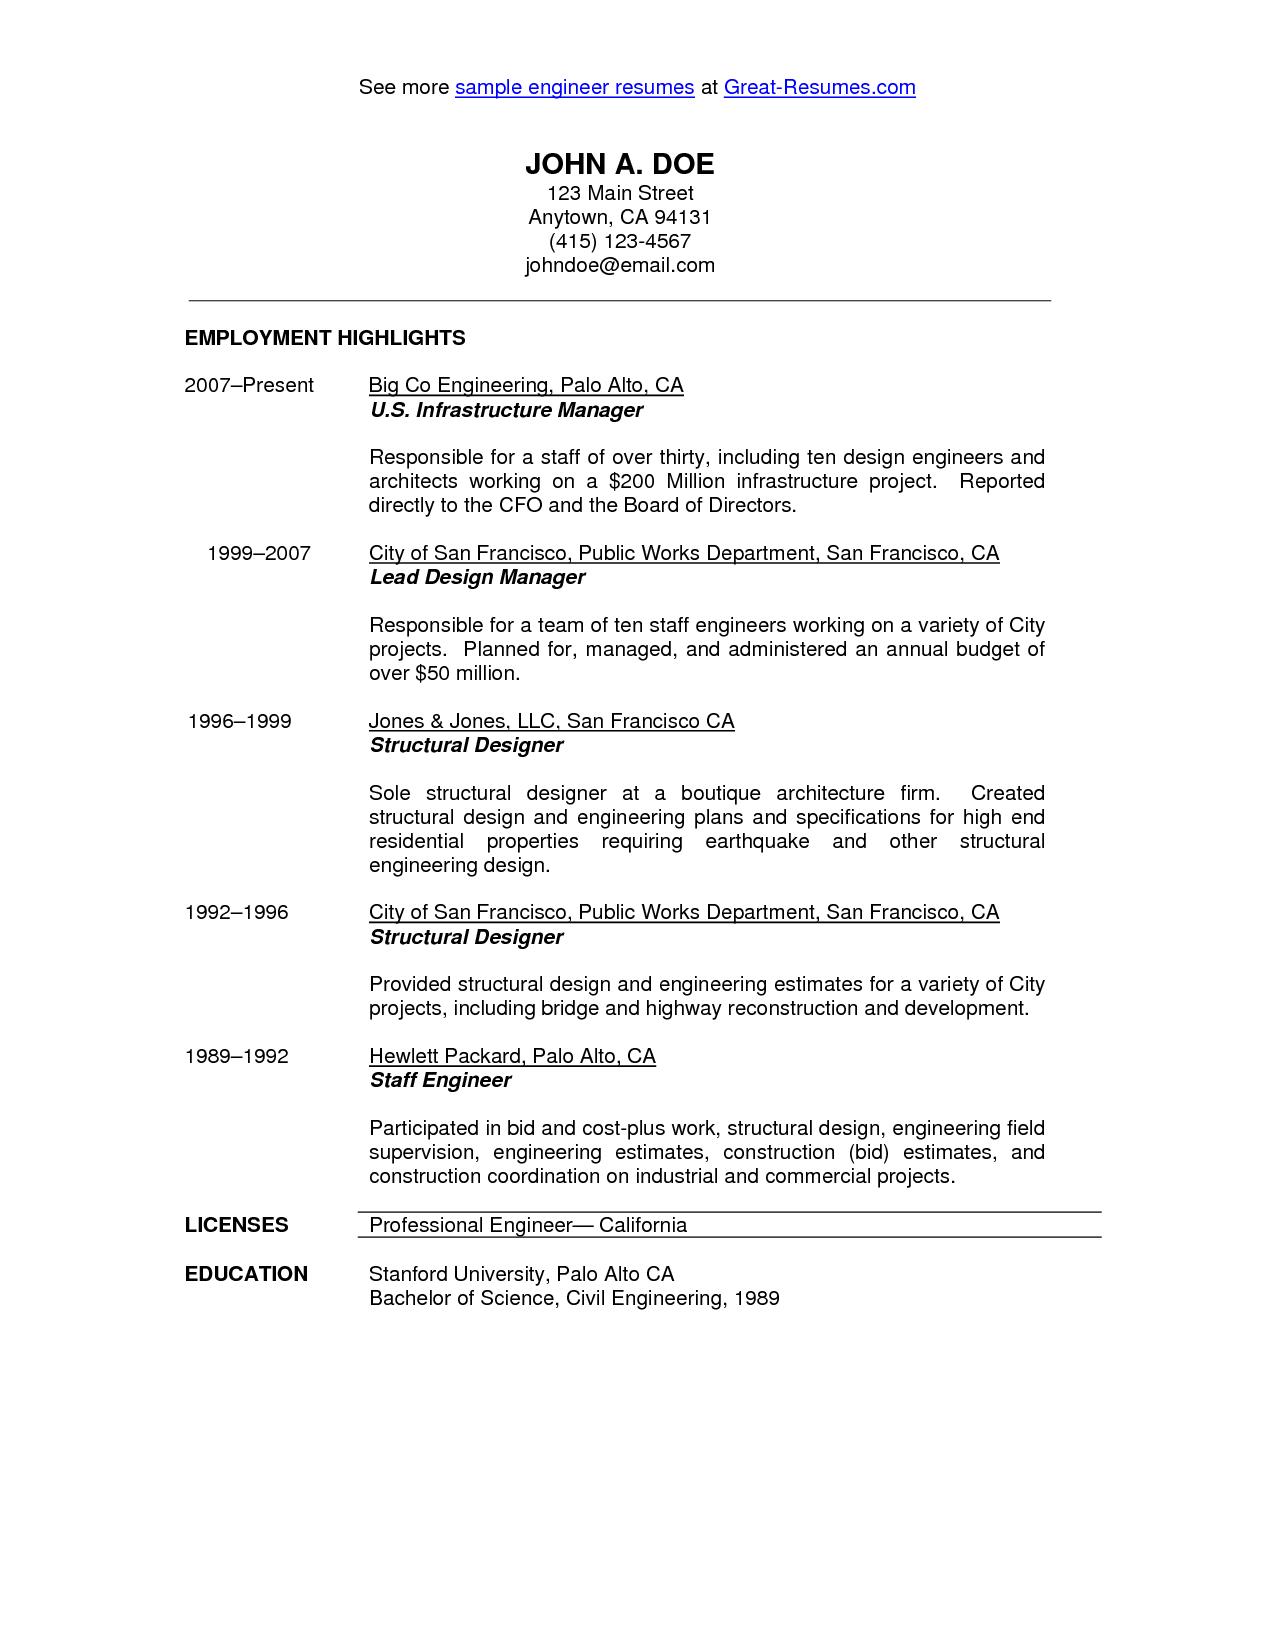 Civil Engineer Resume Sample Resumecareer Info Civil